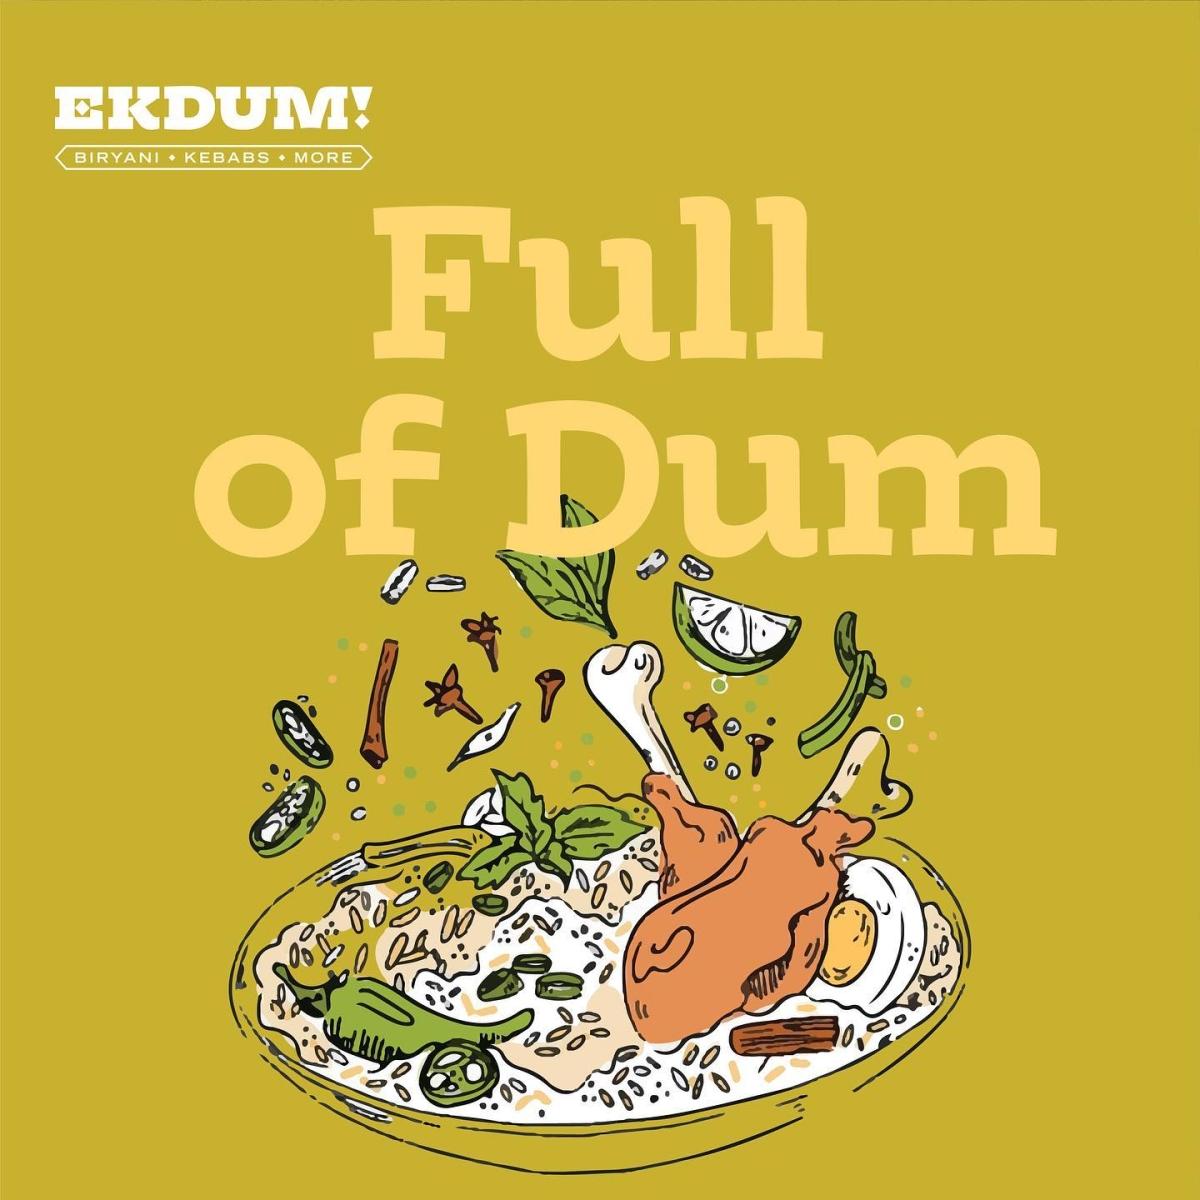 Domino's owner Jubilant FoodWorks enters biryani biz with 'Ekdum!'